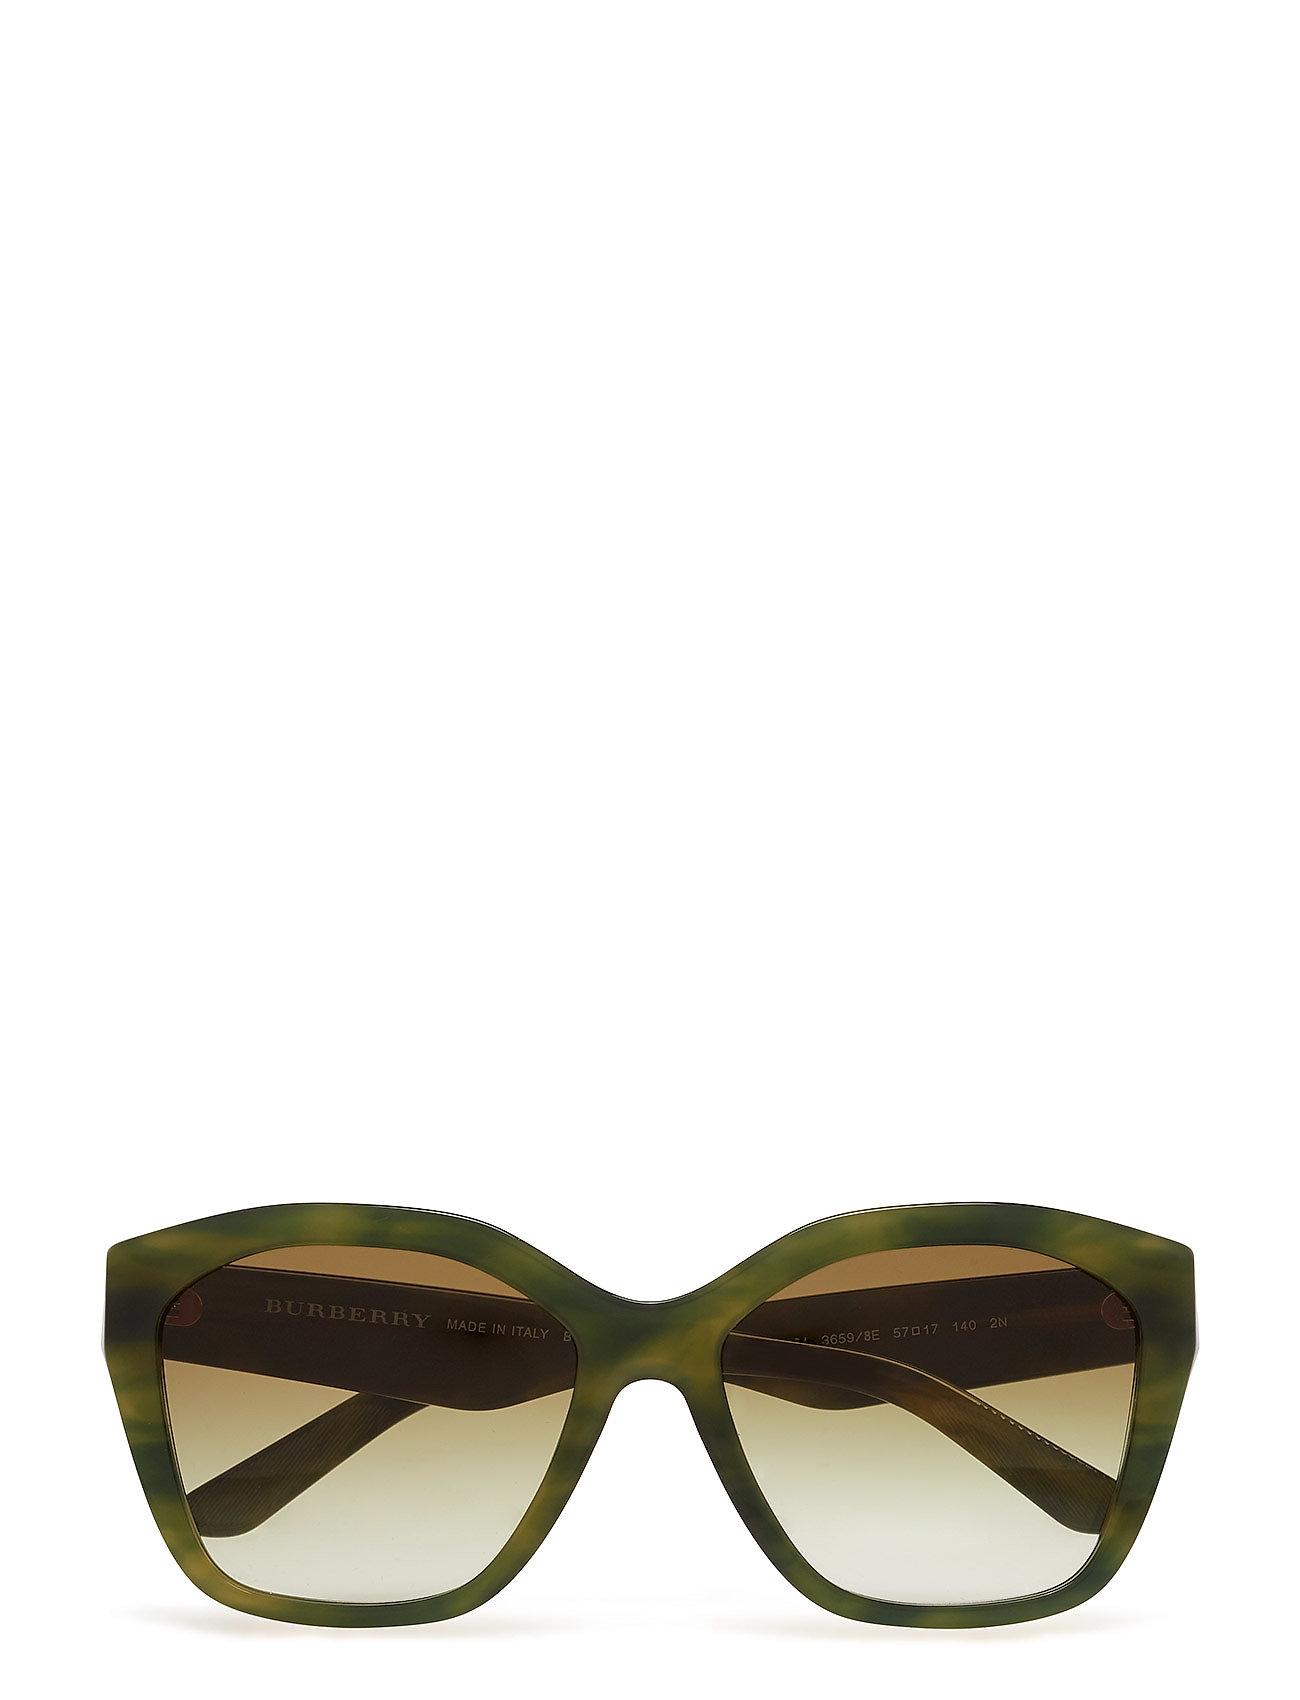 Burberry Sunglasses 0BE4261